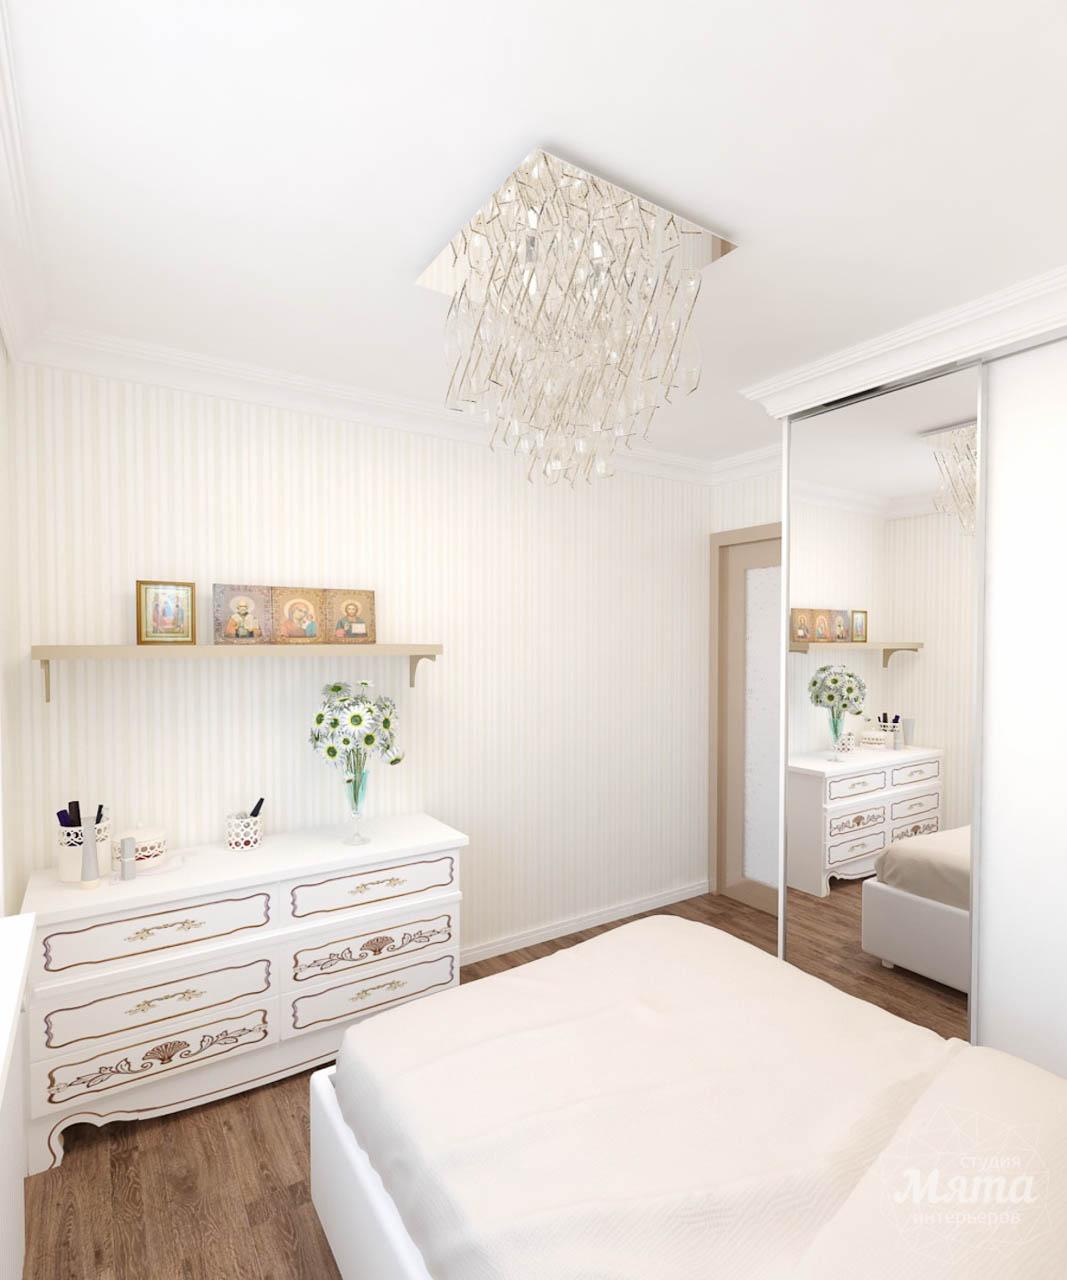 Дизайн интерьера и ремонт однокомнатной квартиры по ул. Бажова 134 img926028175